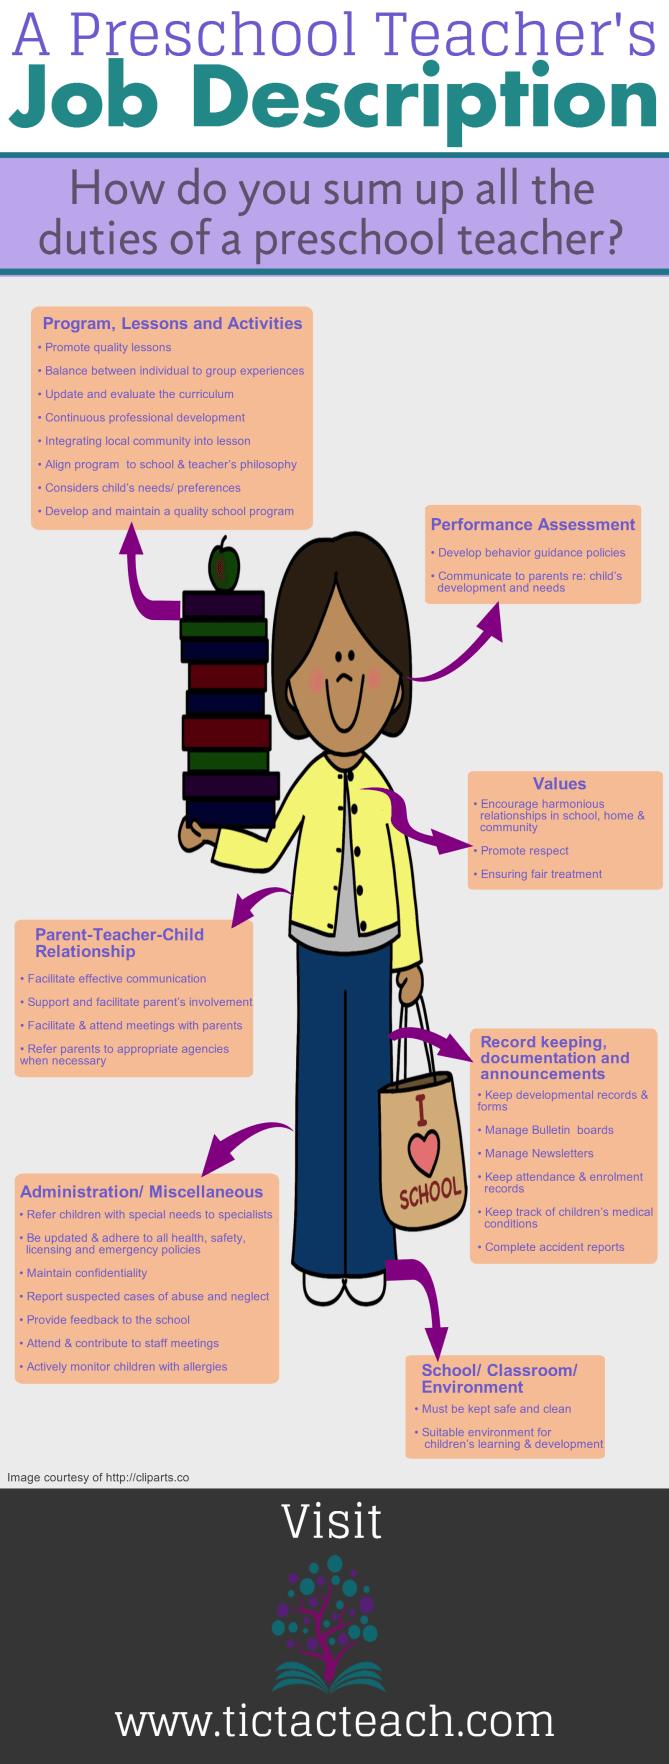 Preschool Teacher's job description infographic